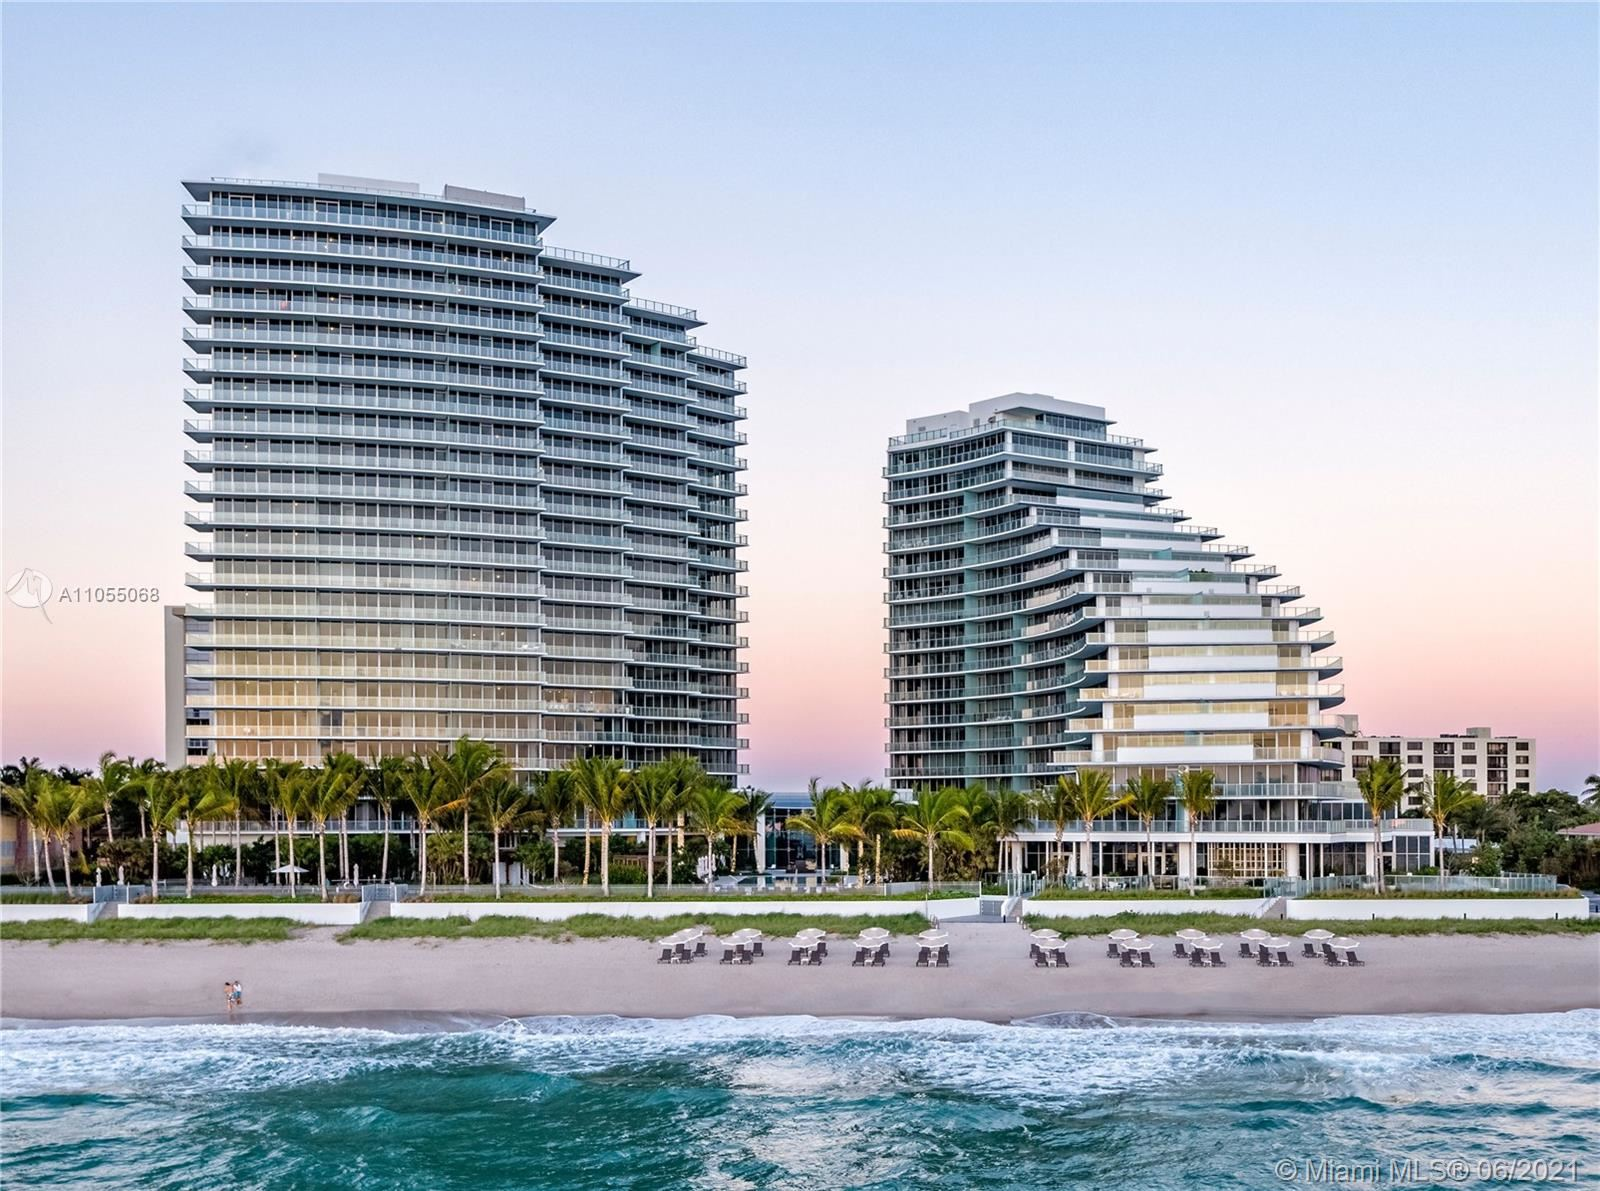 2200 N Ocean Blvd #S703, Fort Lauderdale, FL 33305 - #: A11055068